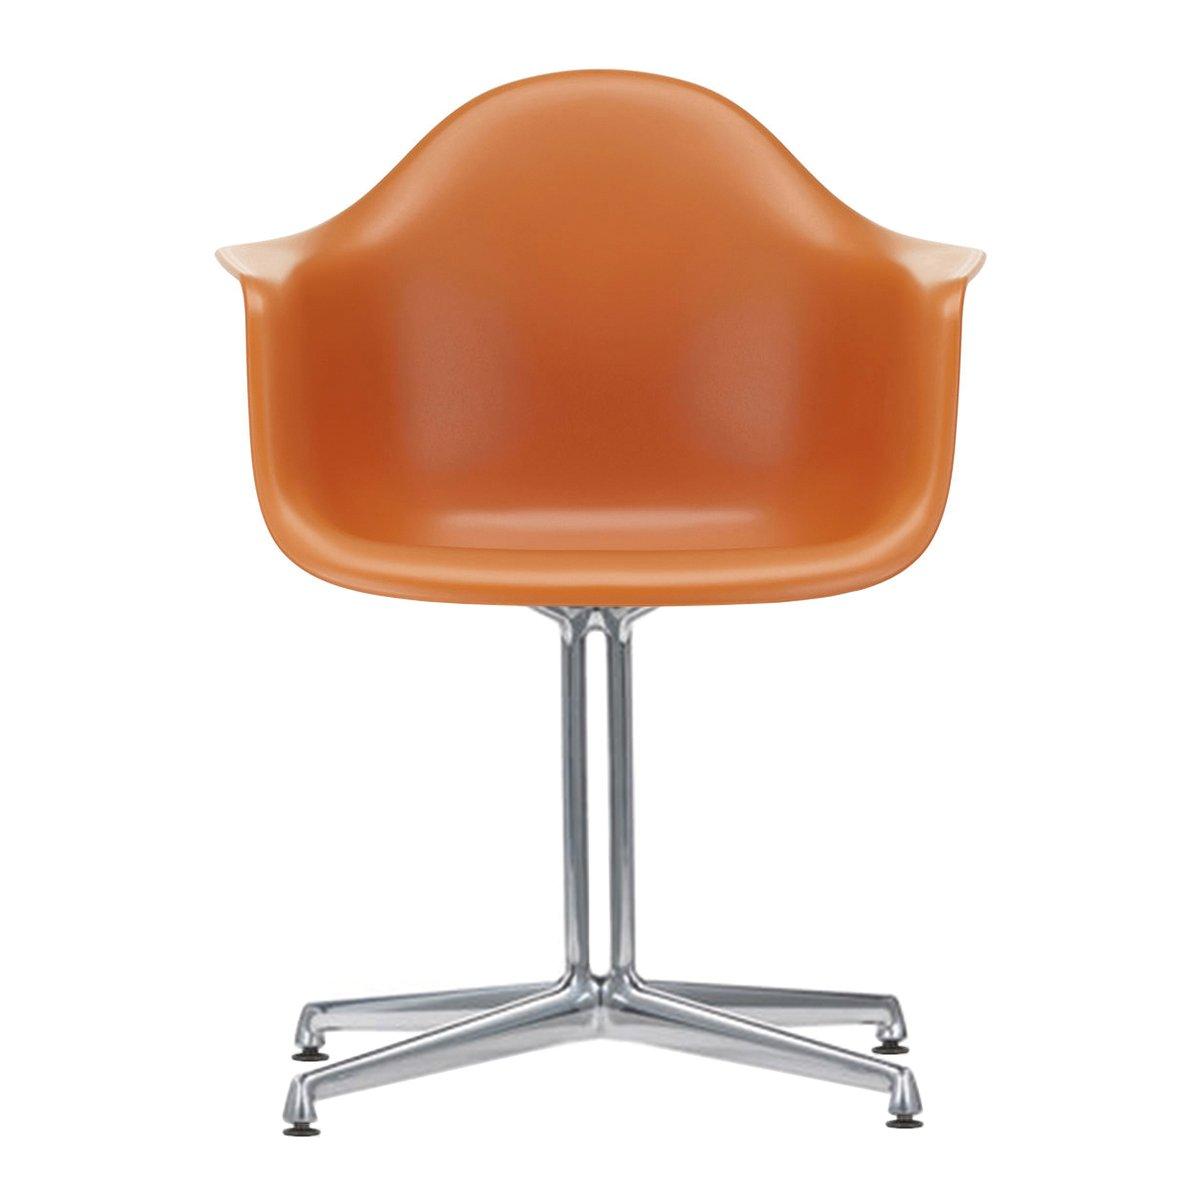 Vitra Eames Plastic Chair DAL Armstoel - Rusty Orange